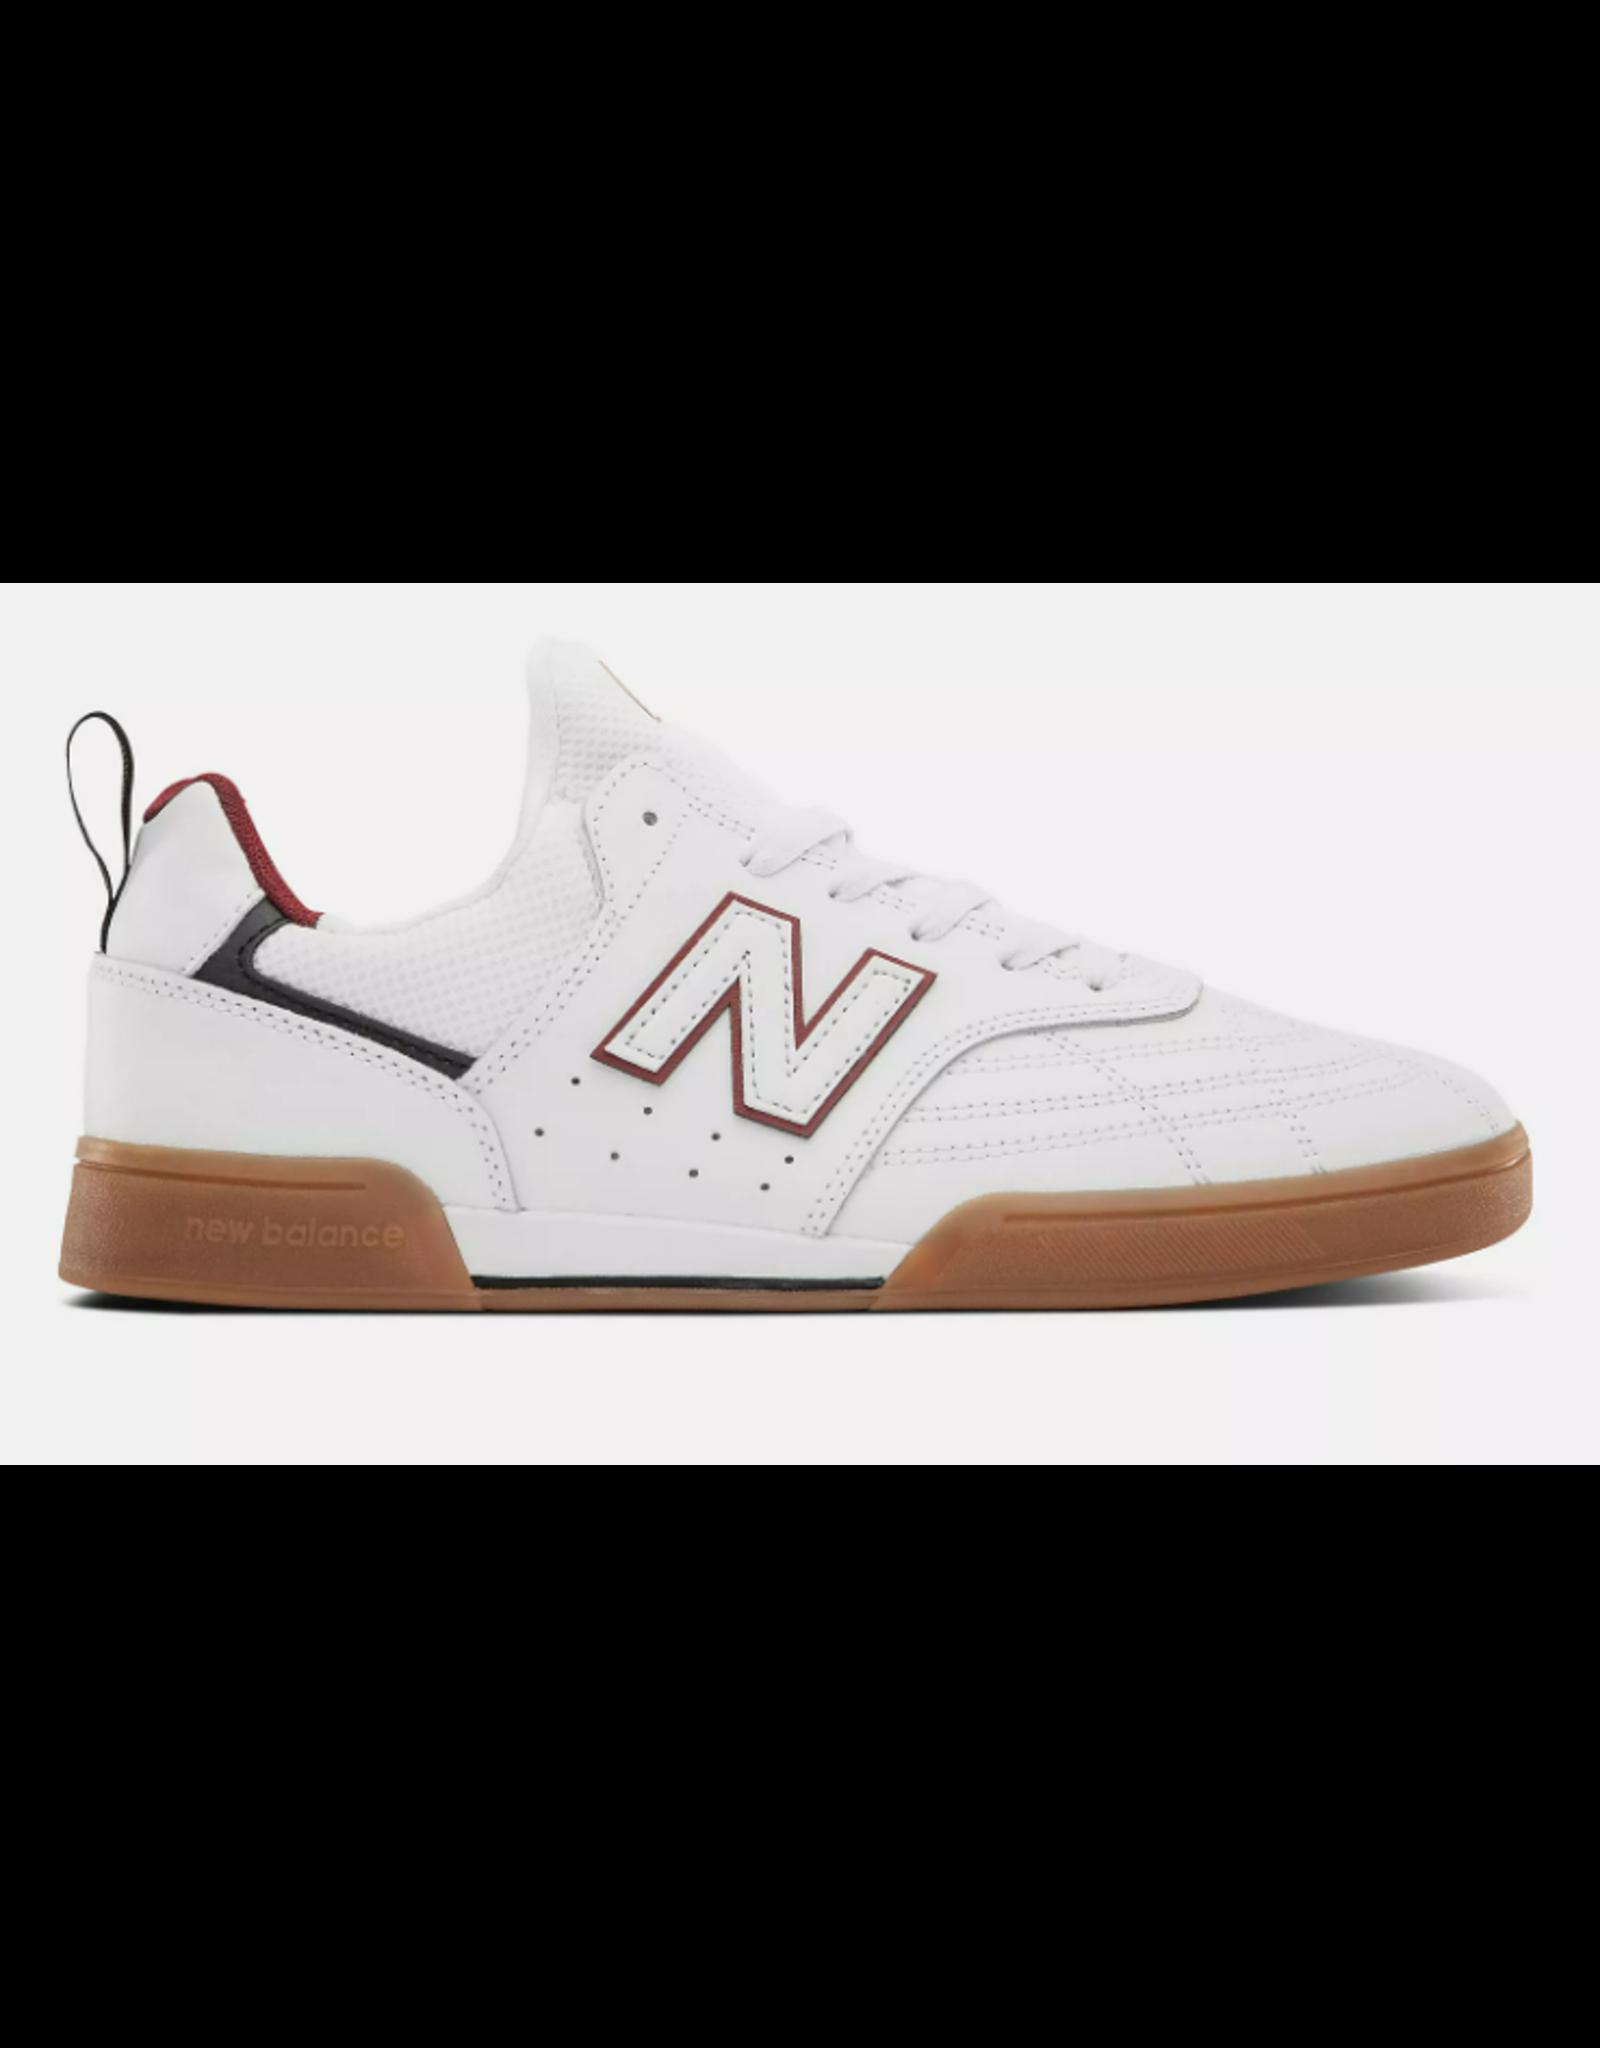 New Balance Numeric 288 Sport Skate Shoe